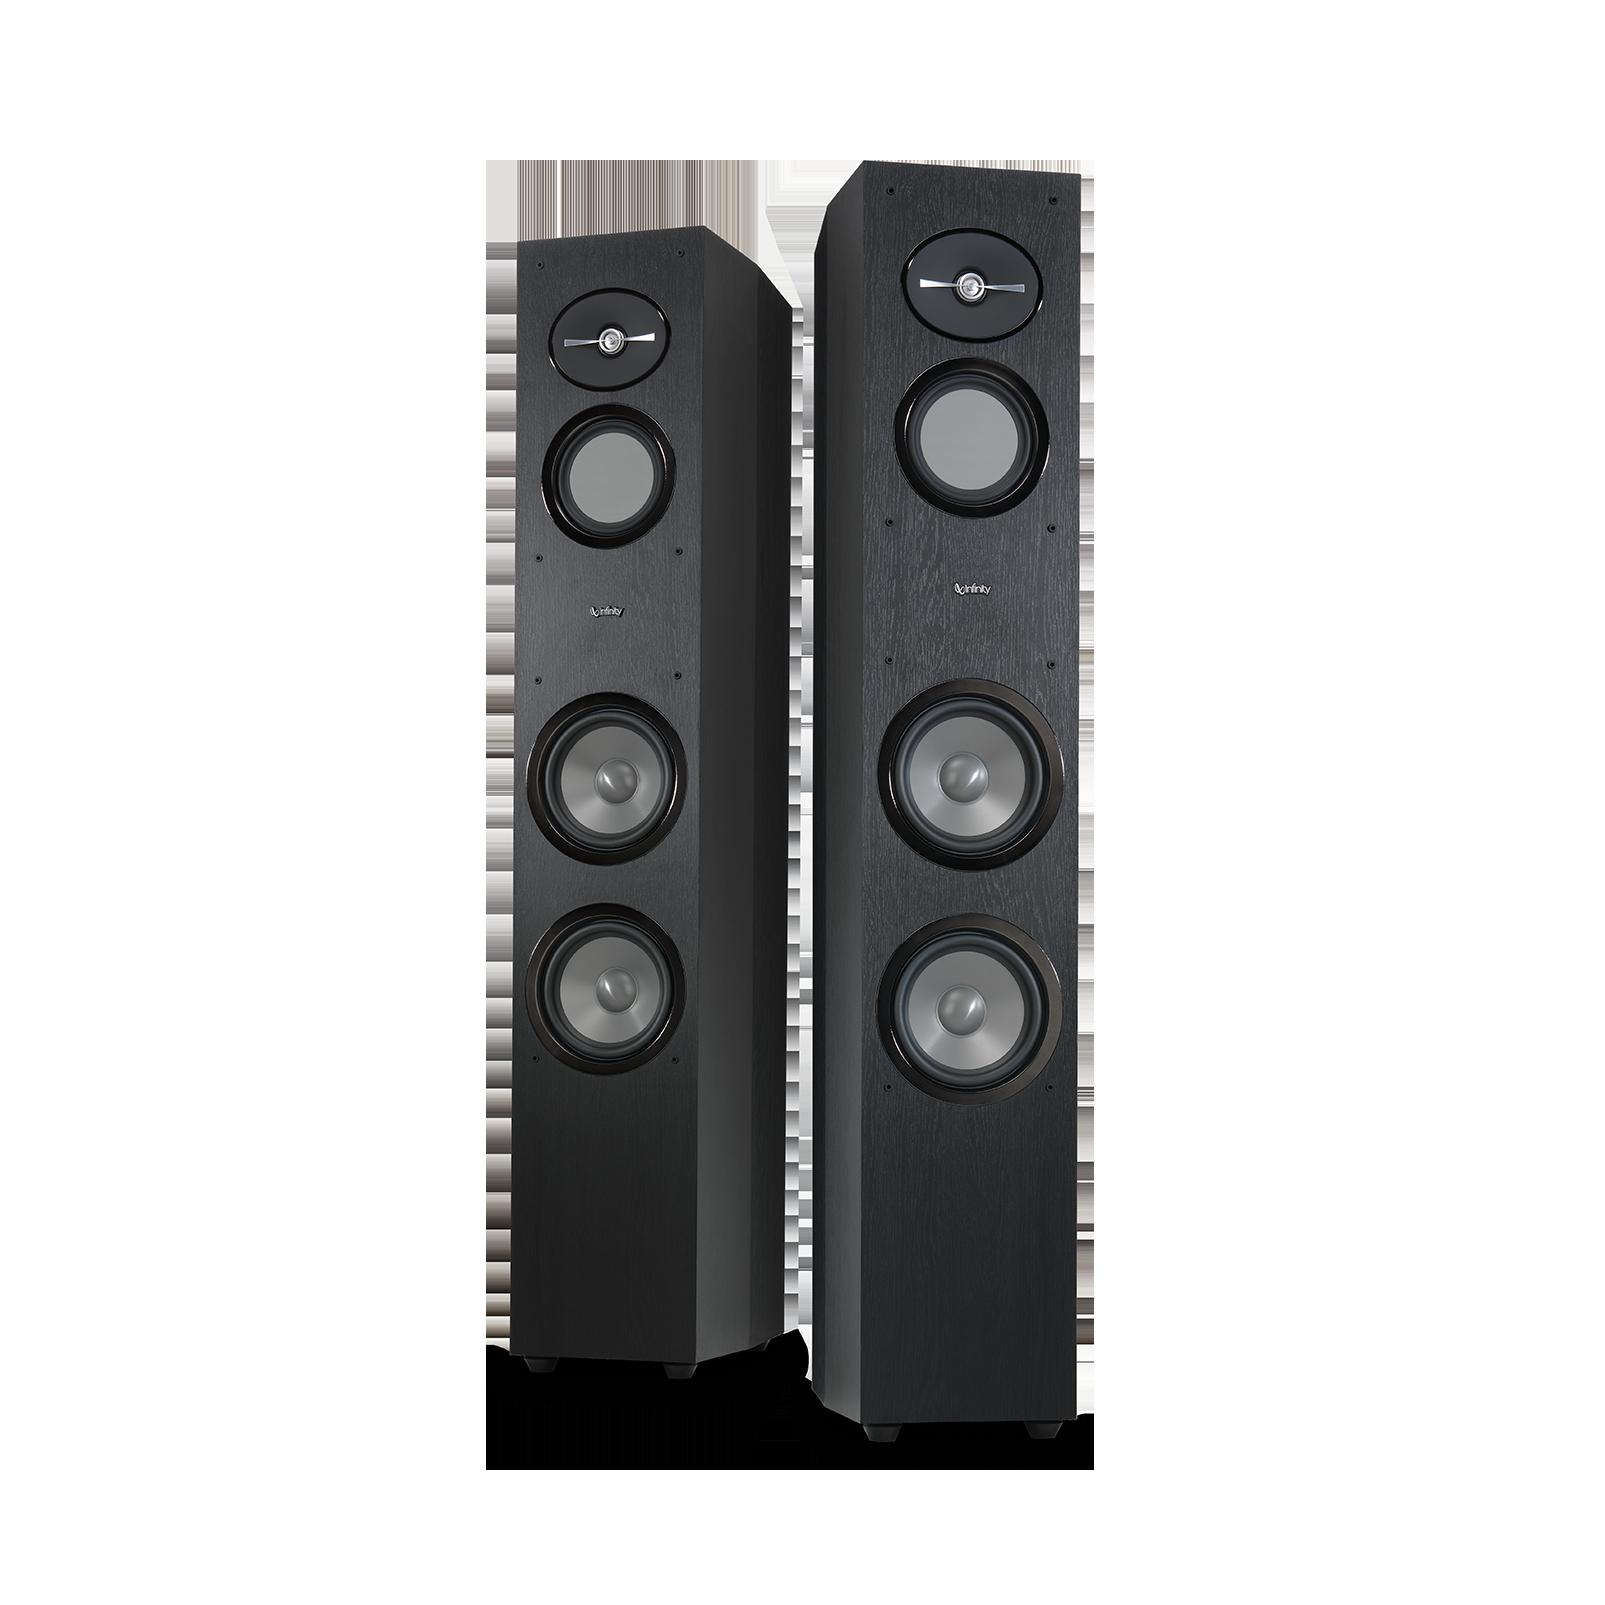 "Reference 263 - Black - 6-1/2"" 3-Way Floorstanding Loudspeaker - Detailshot 4"